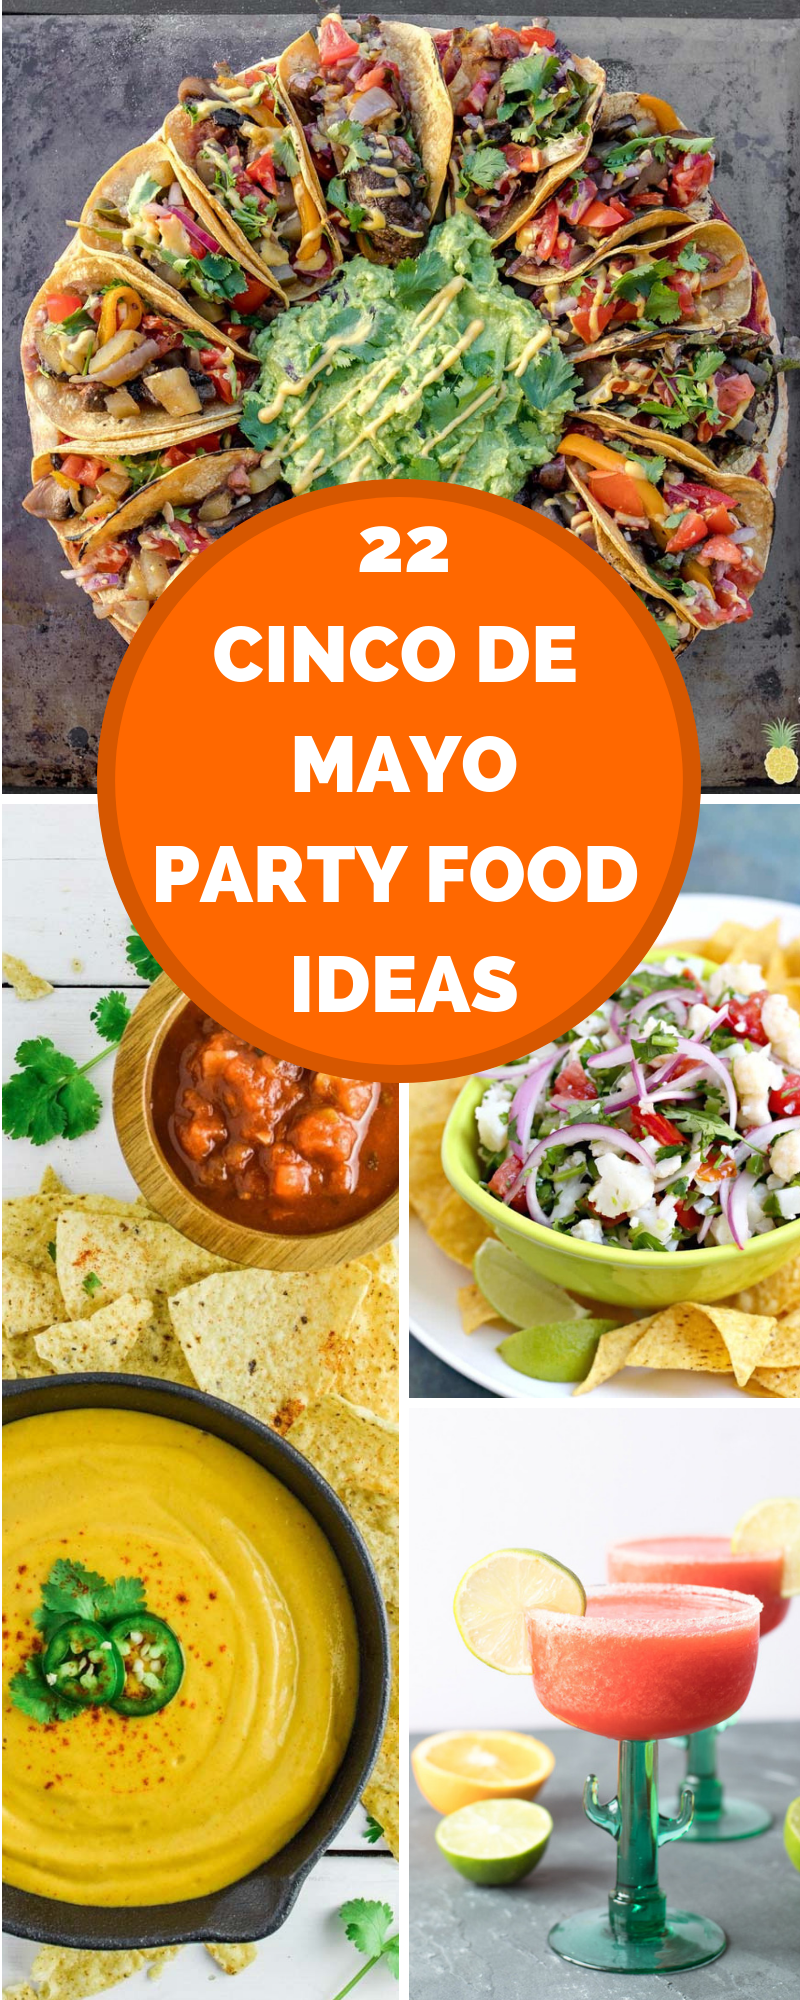 22 Vegan Cinco de Mayo Party Food Ideas « Dora's Table | Vegan Mexican Recipes